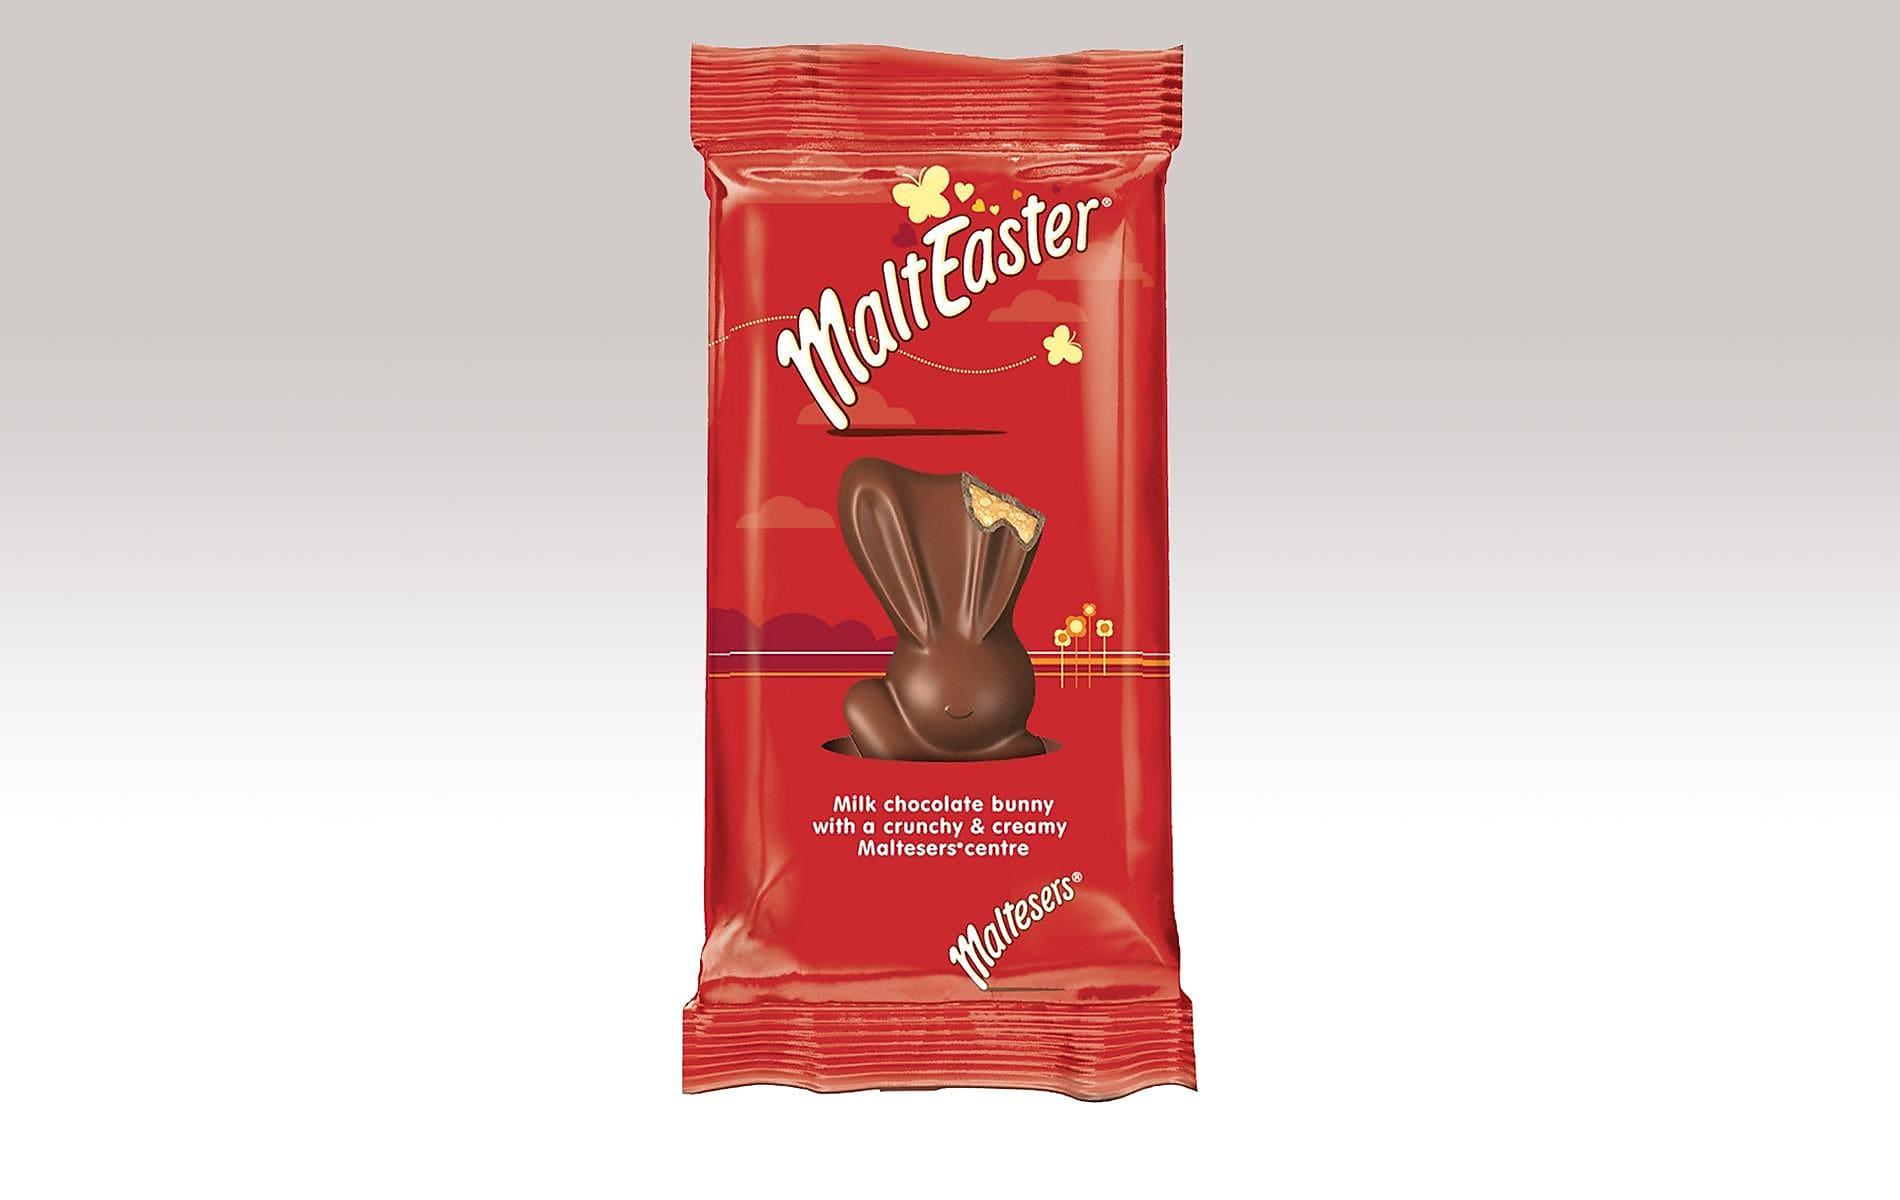 Malteaster Bunny - 3 for £1.50